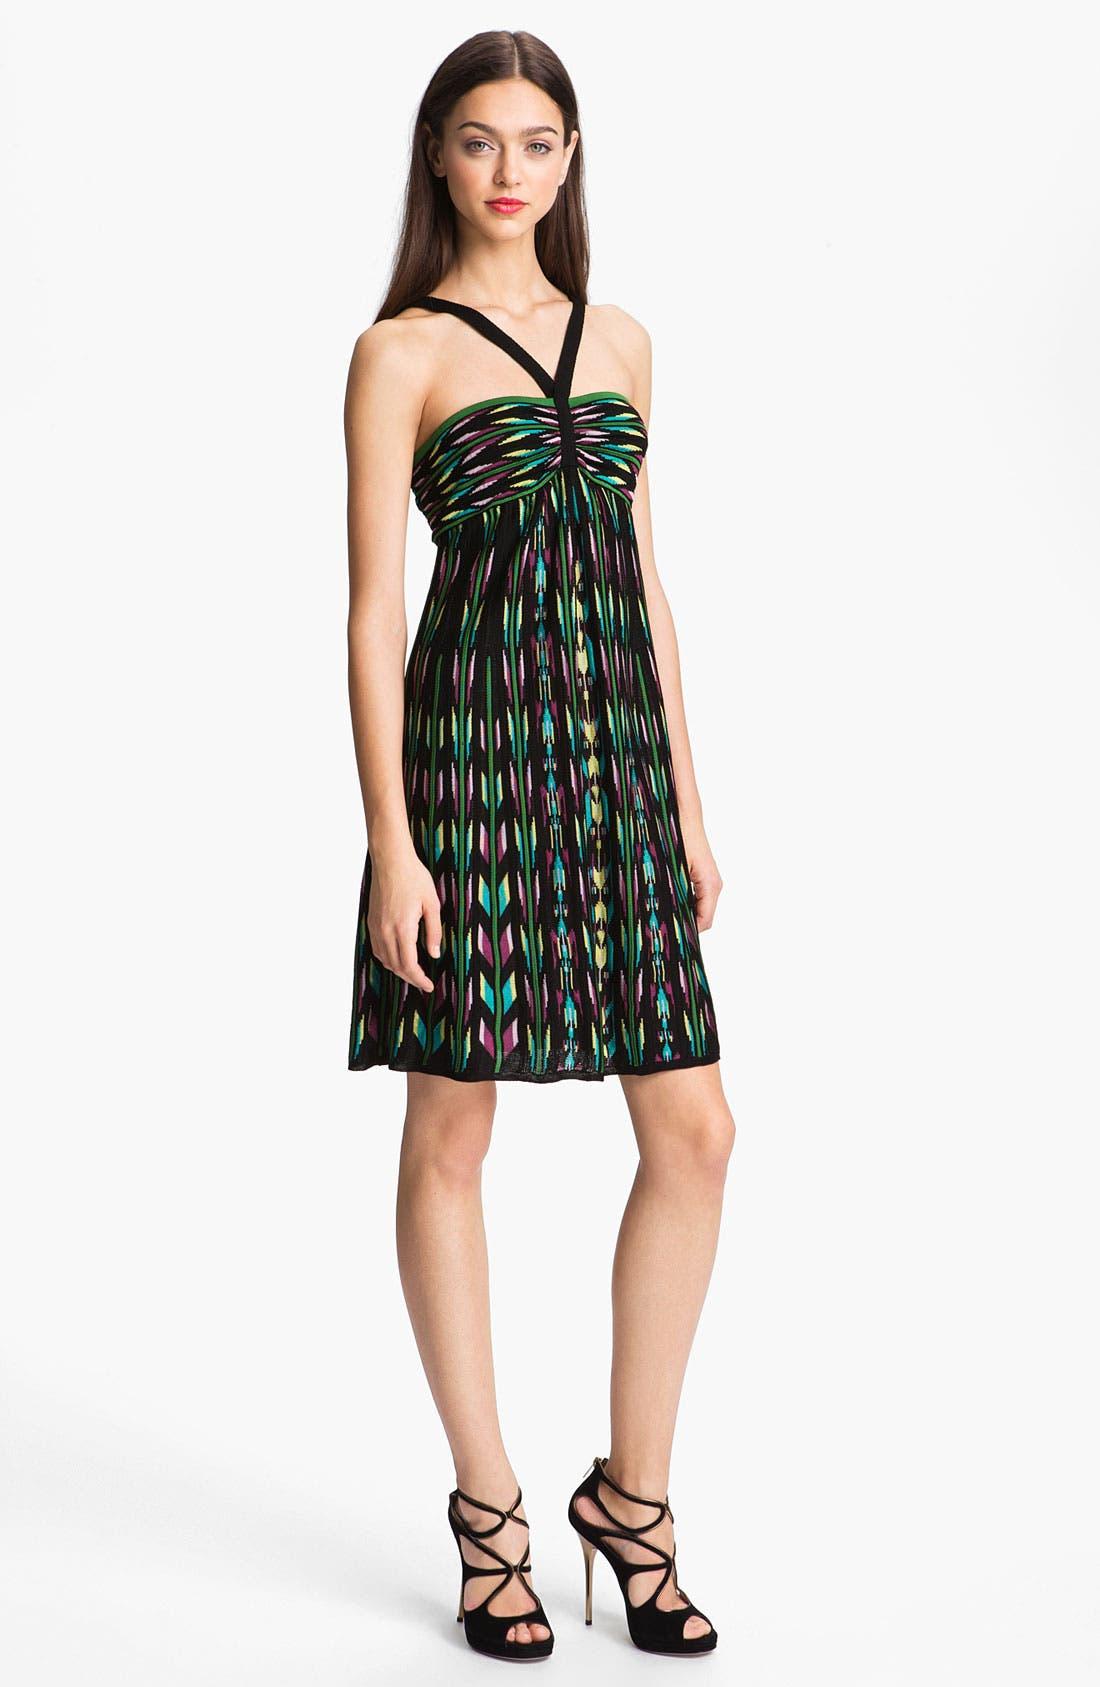 Main Image - M Missoni Dress & Accessories